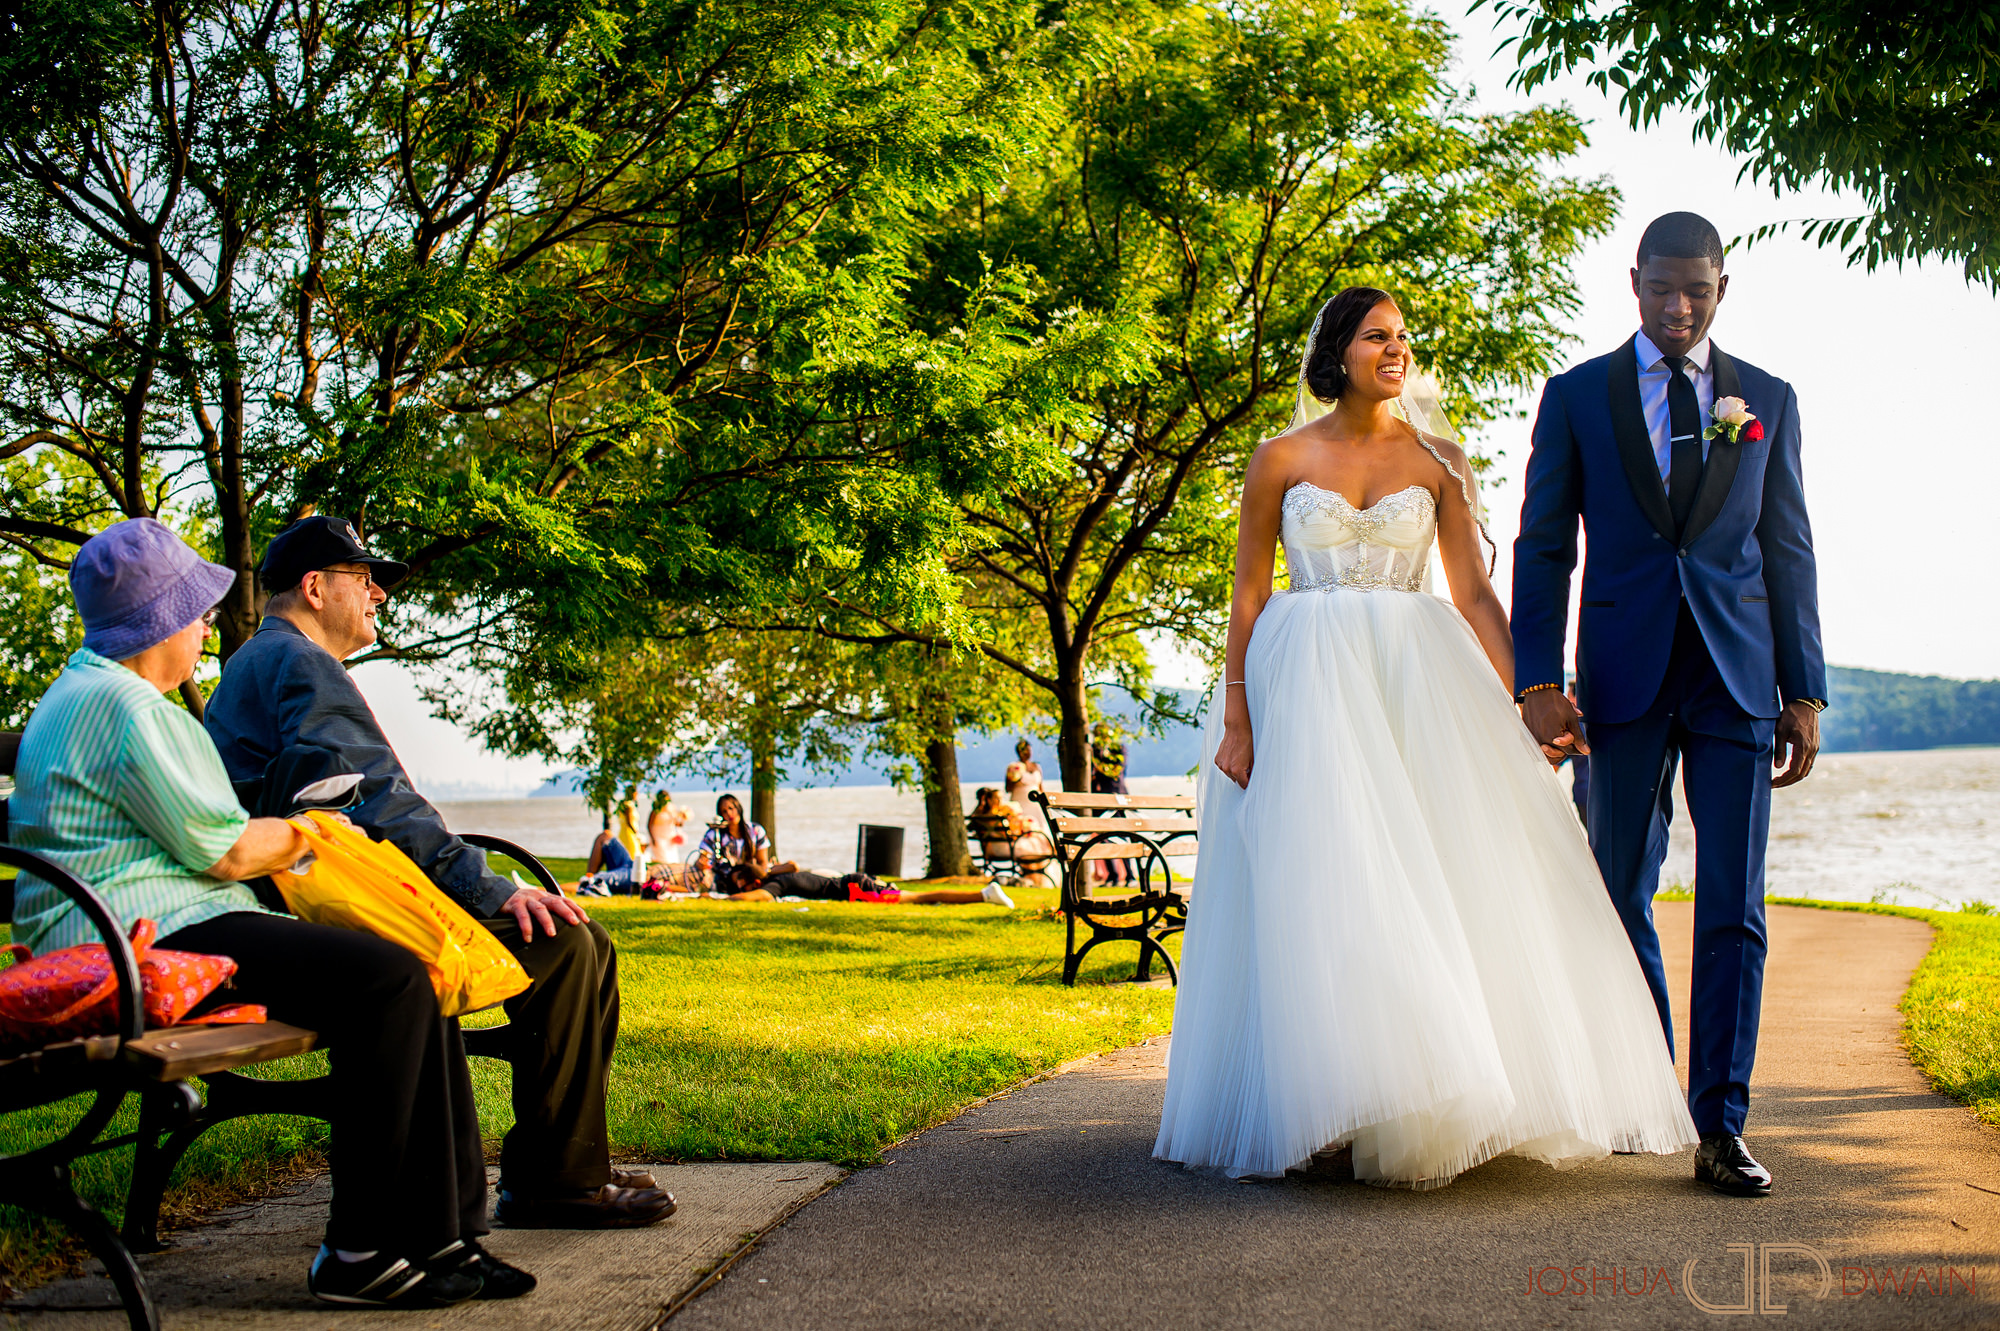 brandie-brendan-24-tarrytown-house-estate-conference-center-wedding-photos-joshua-dwain